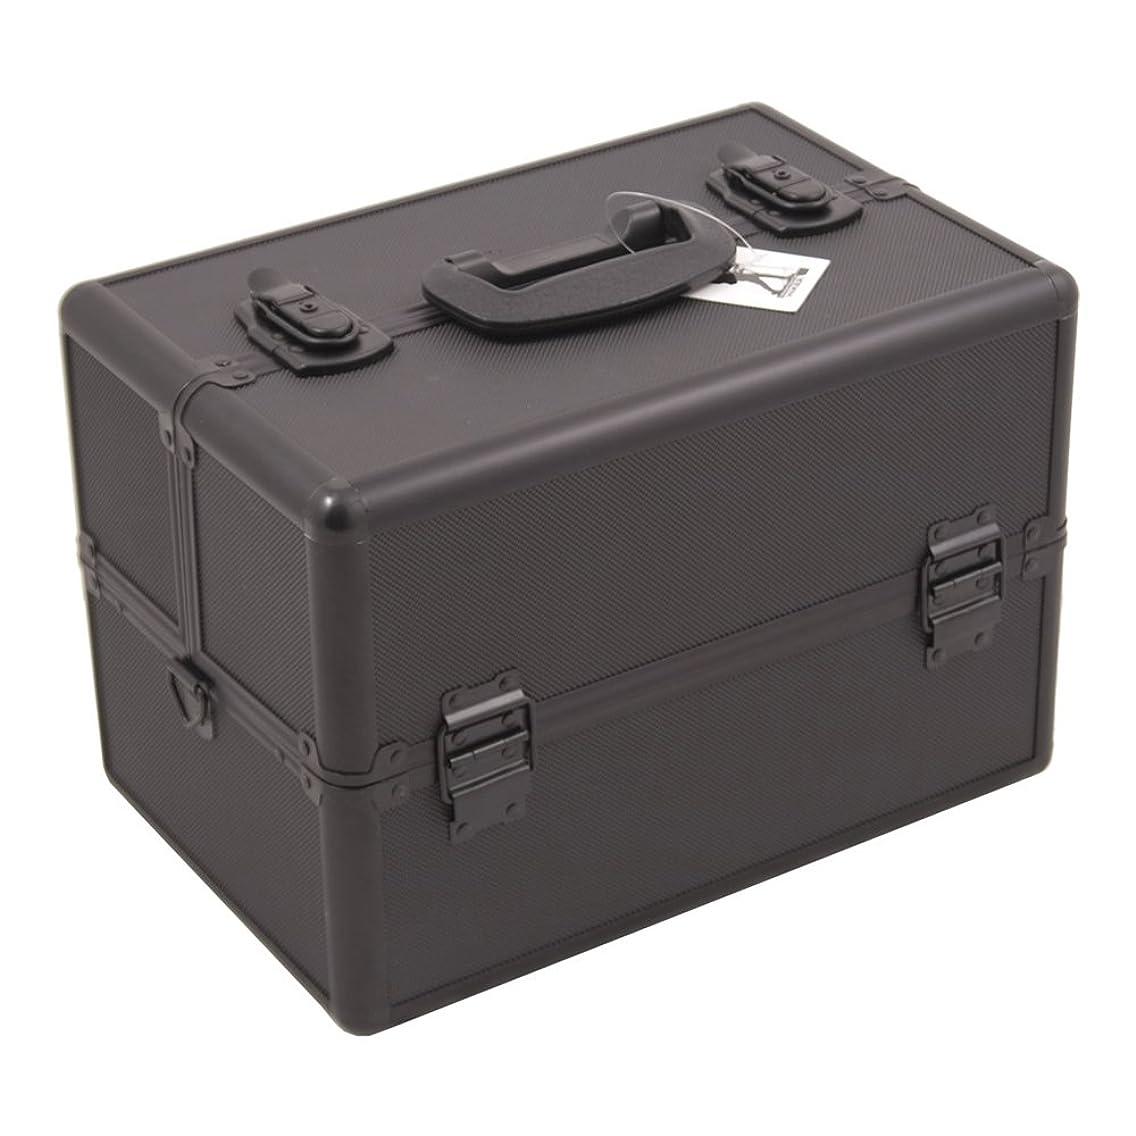 Craft Accents Hk3301 Dot Pro Craft/Quilting Storage Case, Black